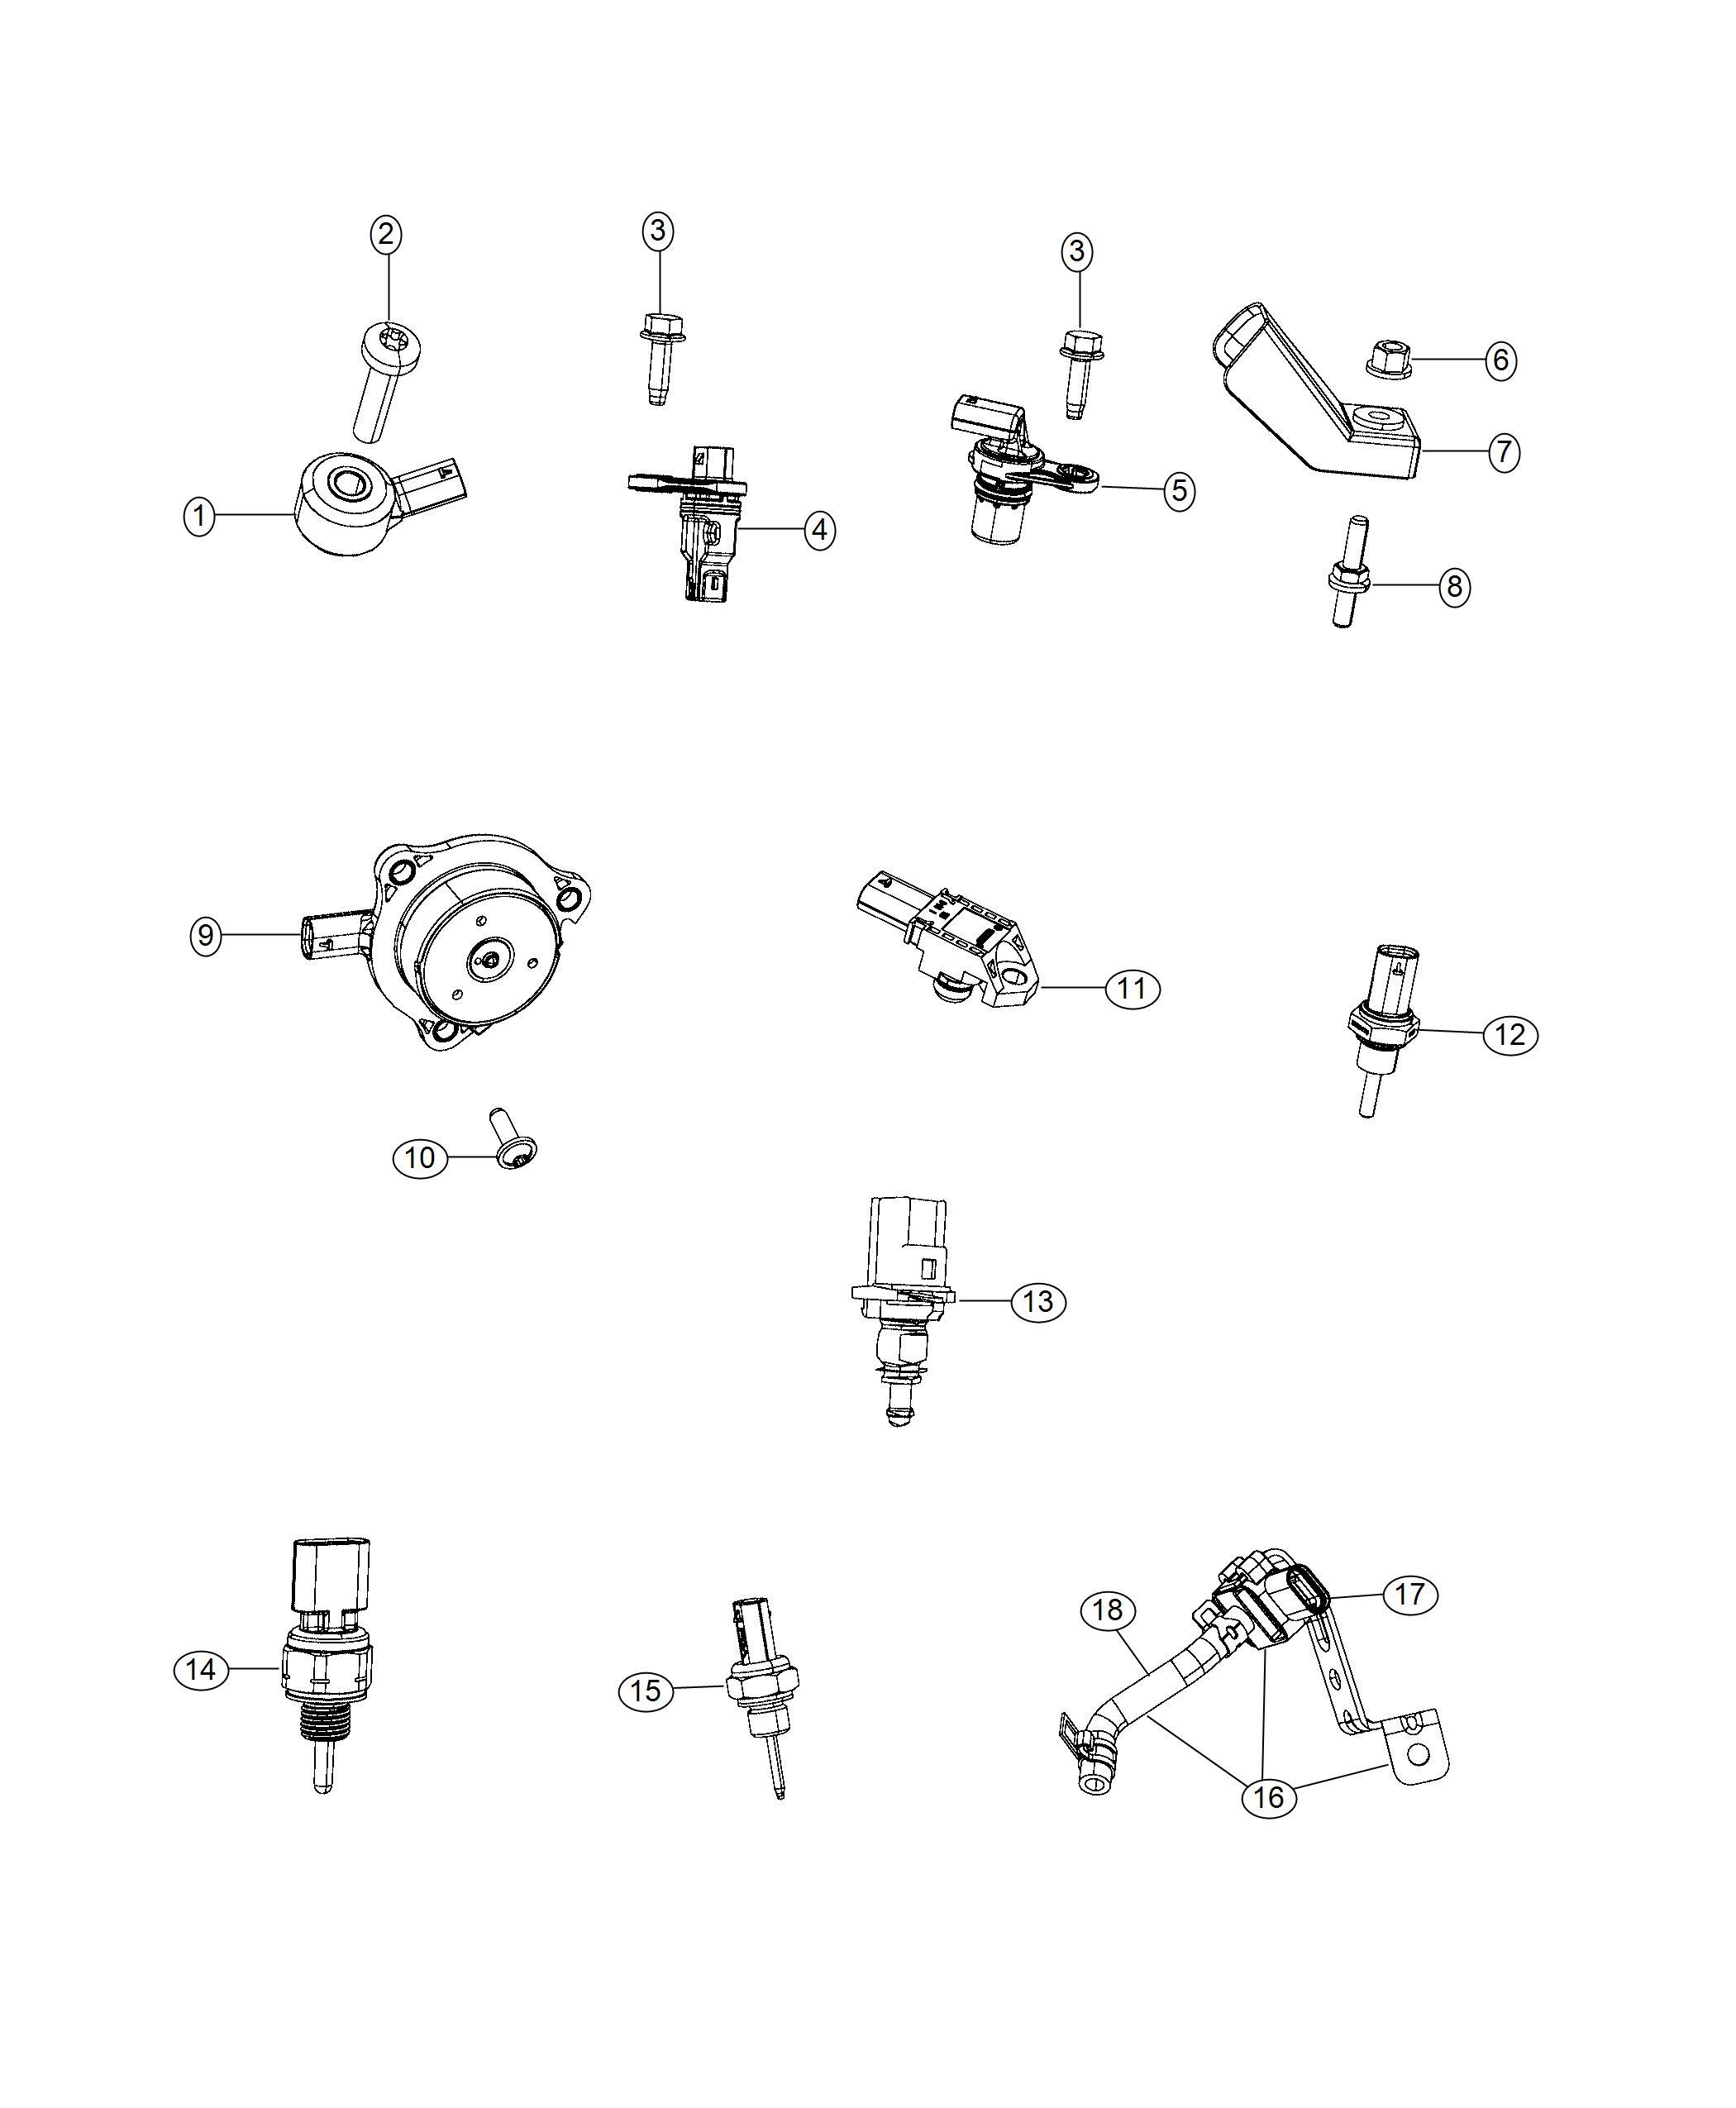 Jeep Wrangler Sensor Crankcase Pressure With Hose